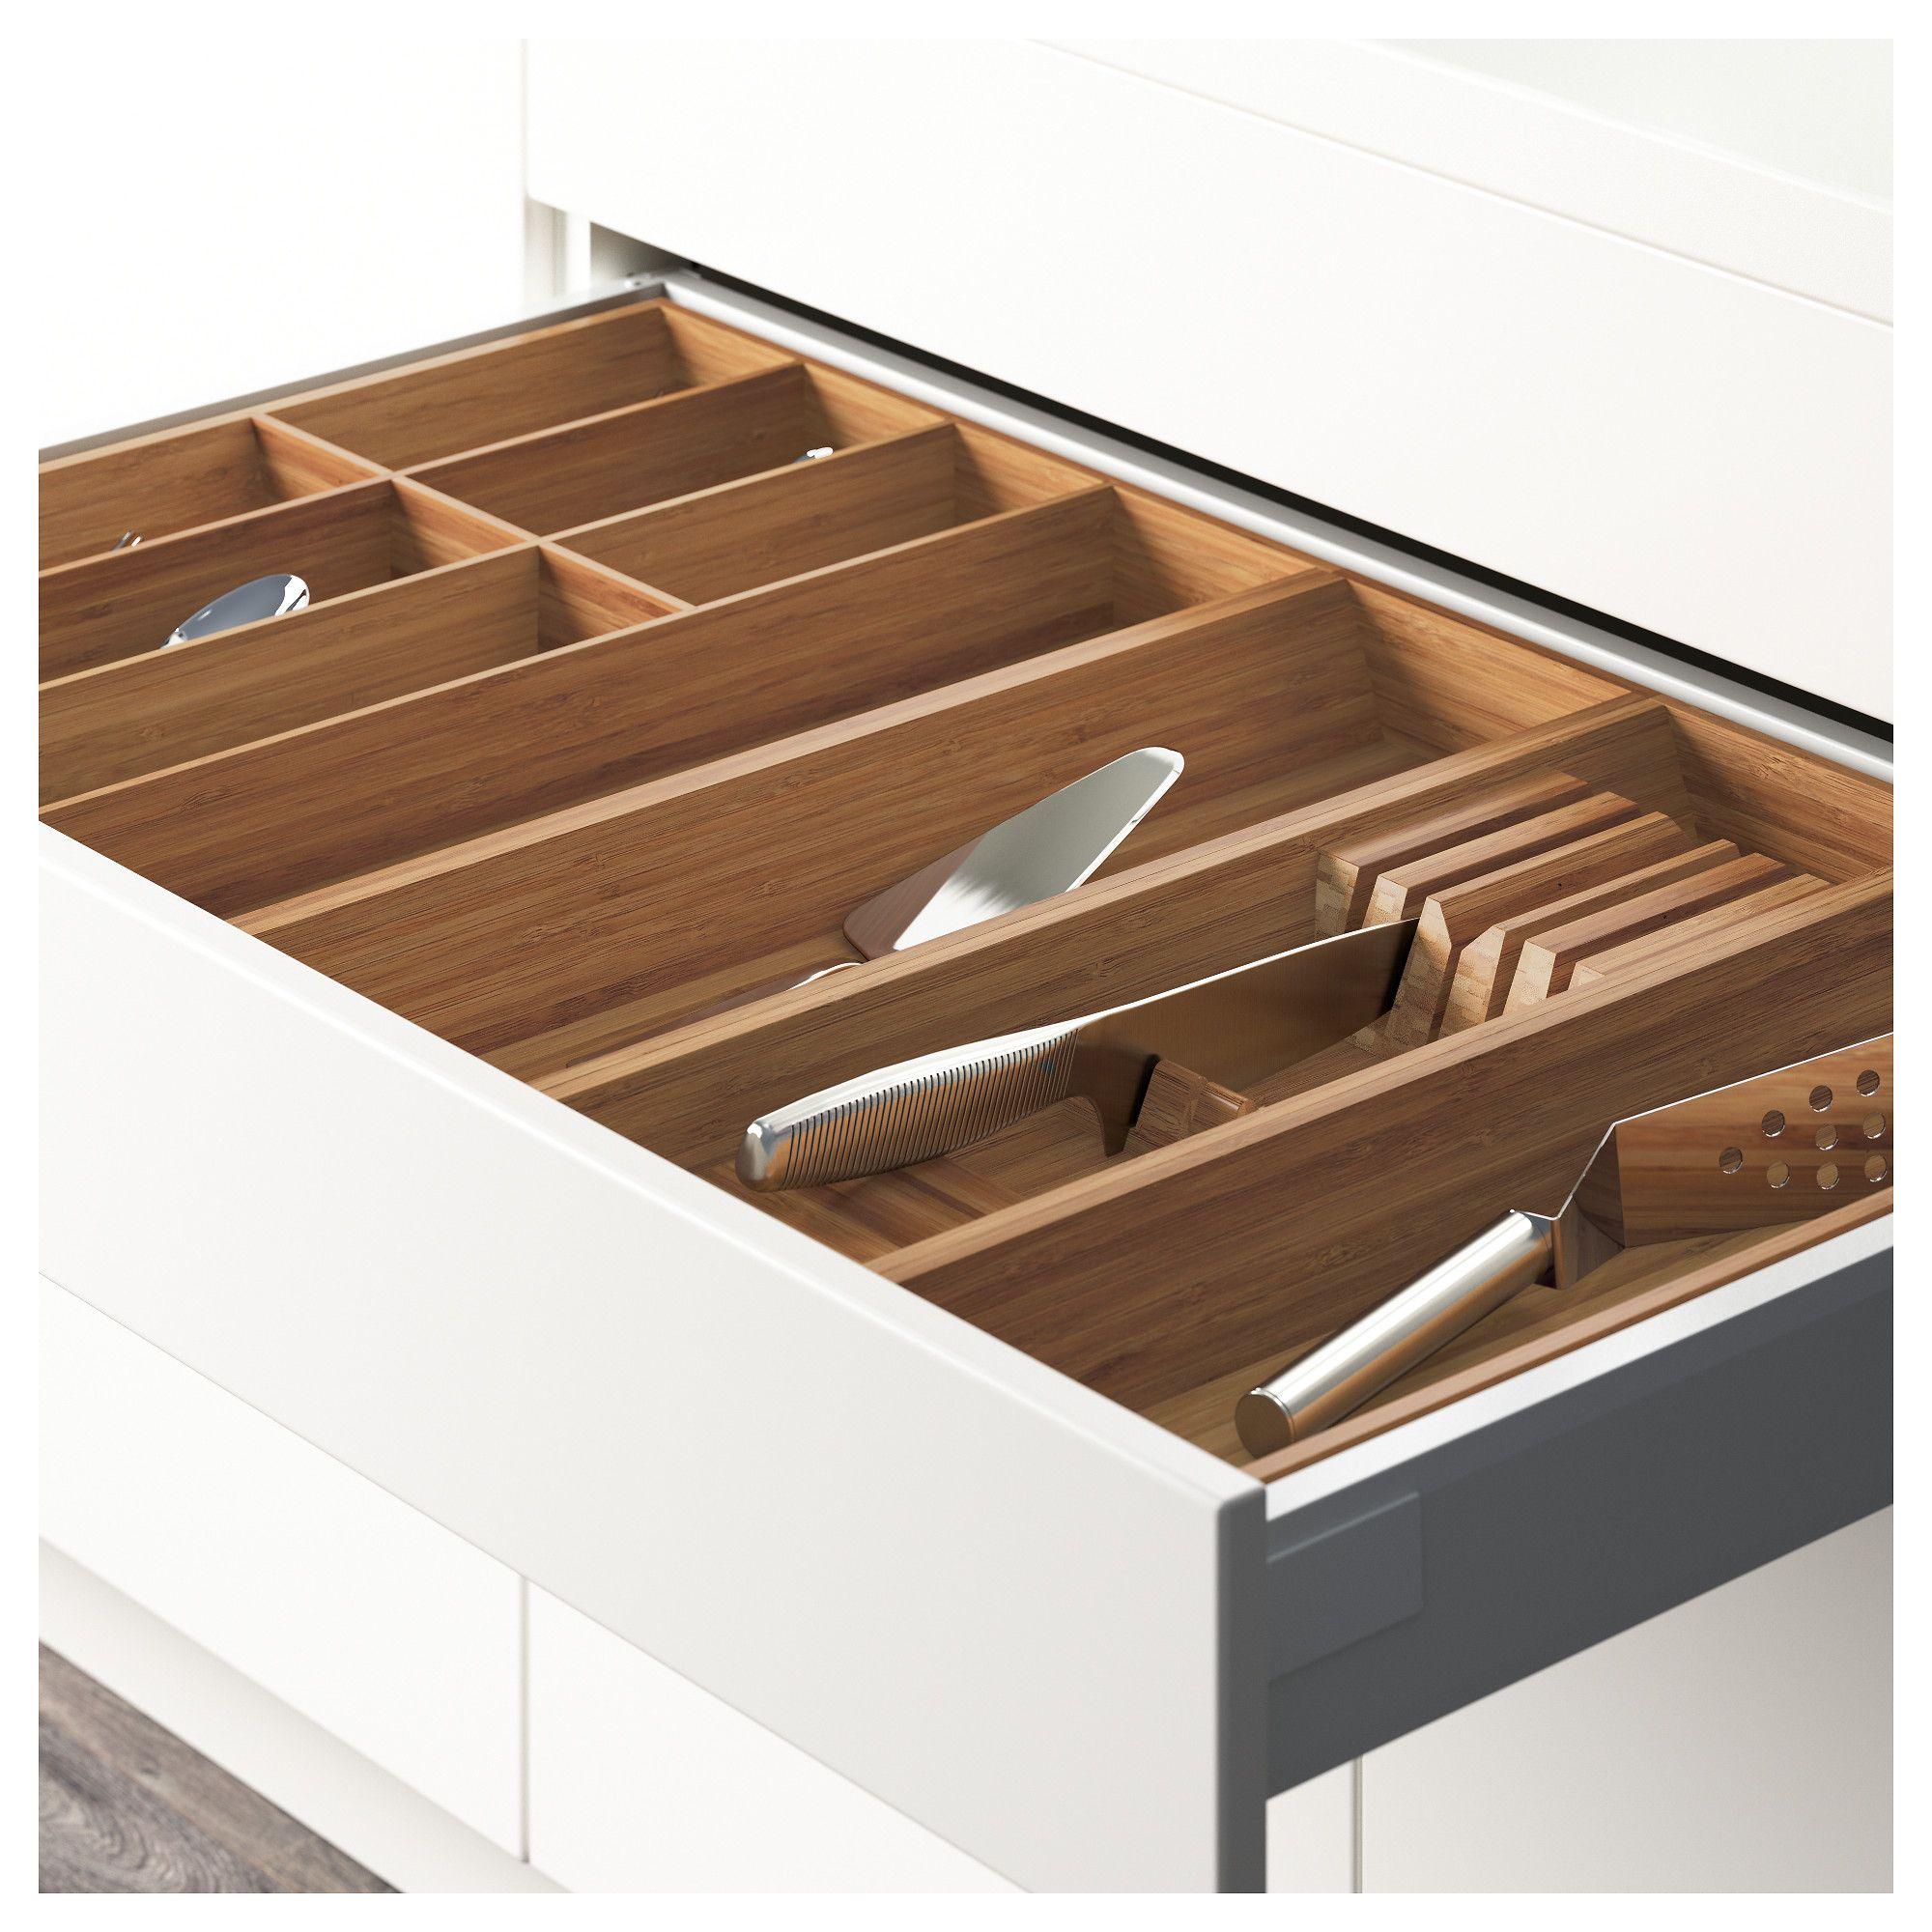 Variera Ikea Detailed Ikea Variera Pot Lid Organizer Review And